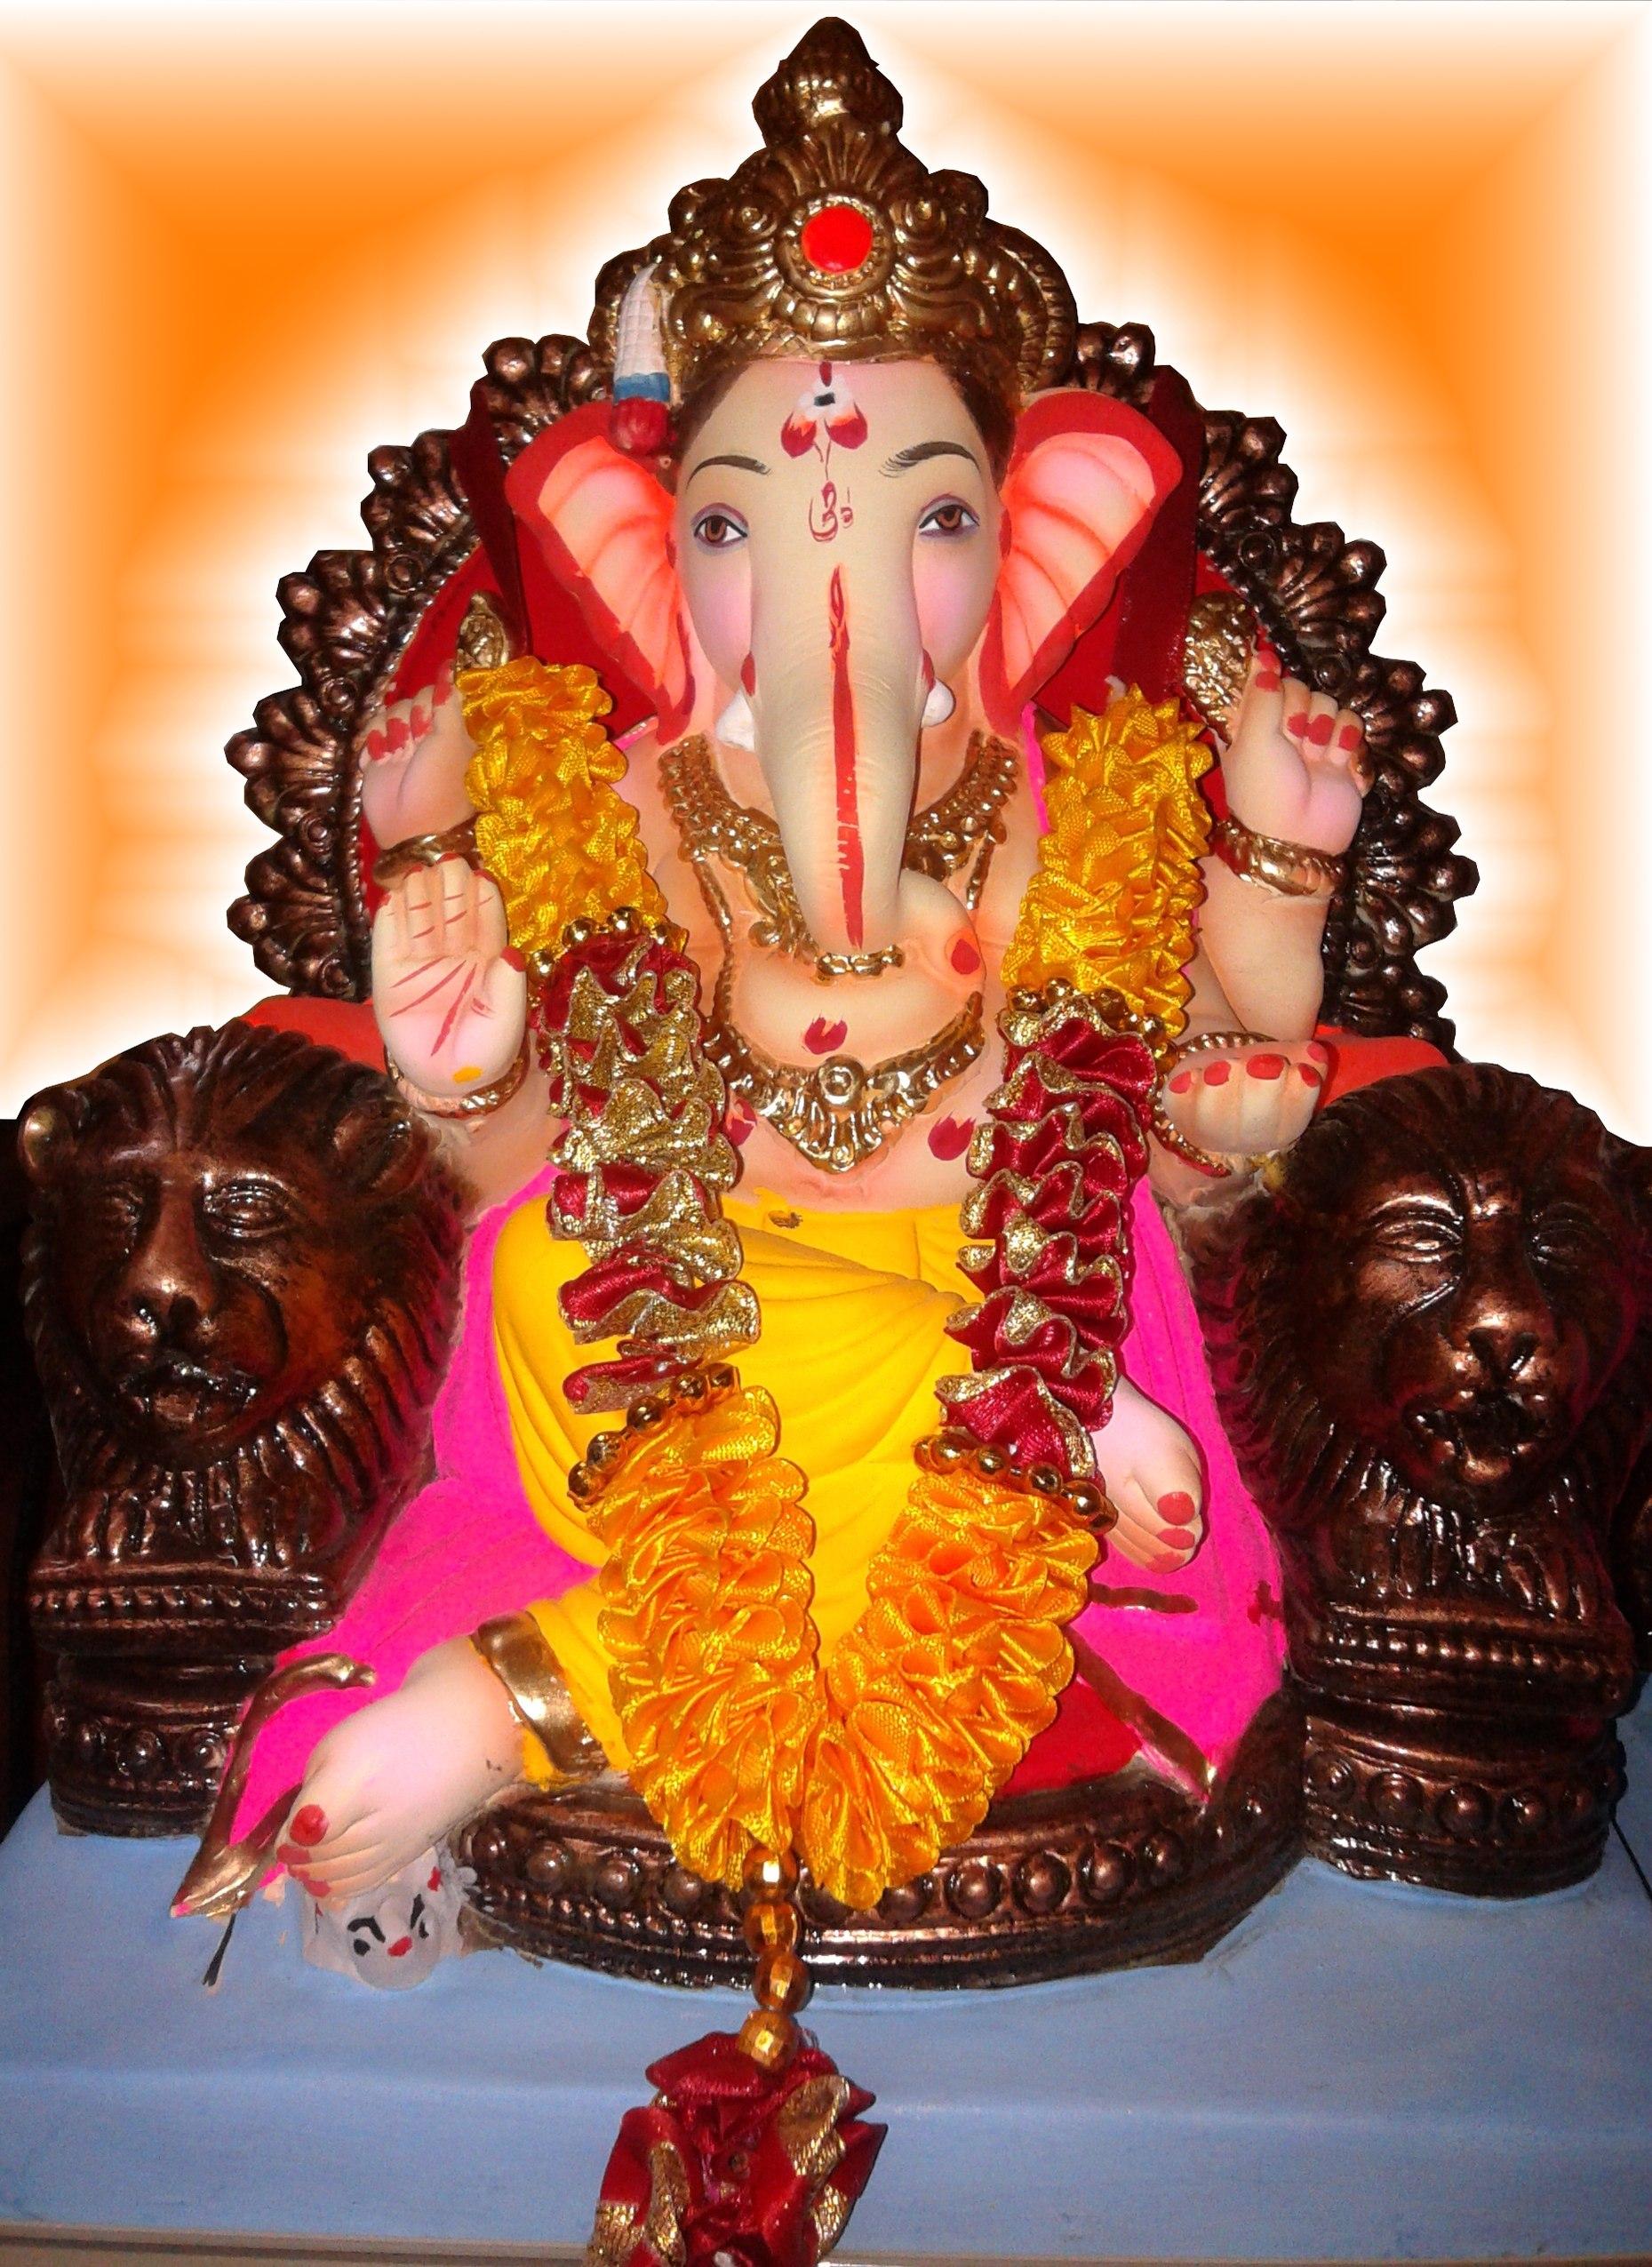 Sankashti Chaturthi - The complete information and online